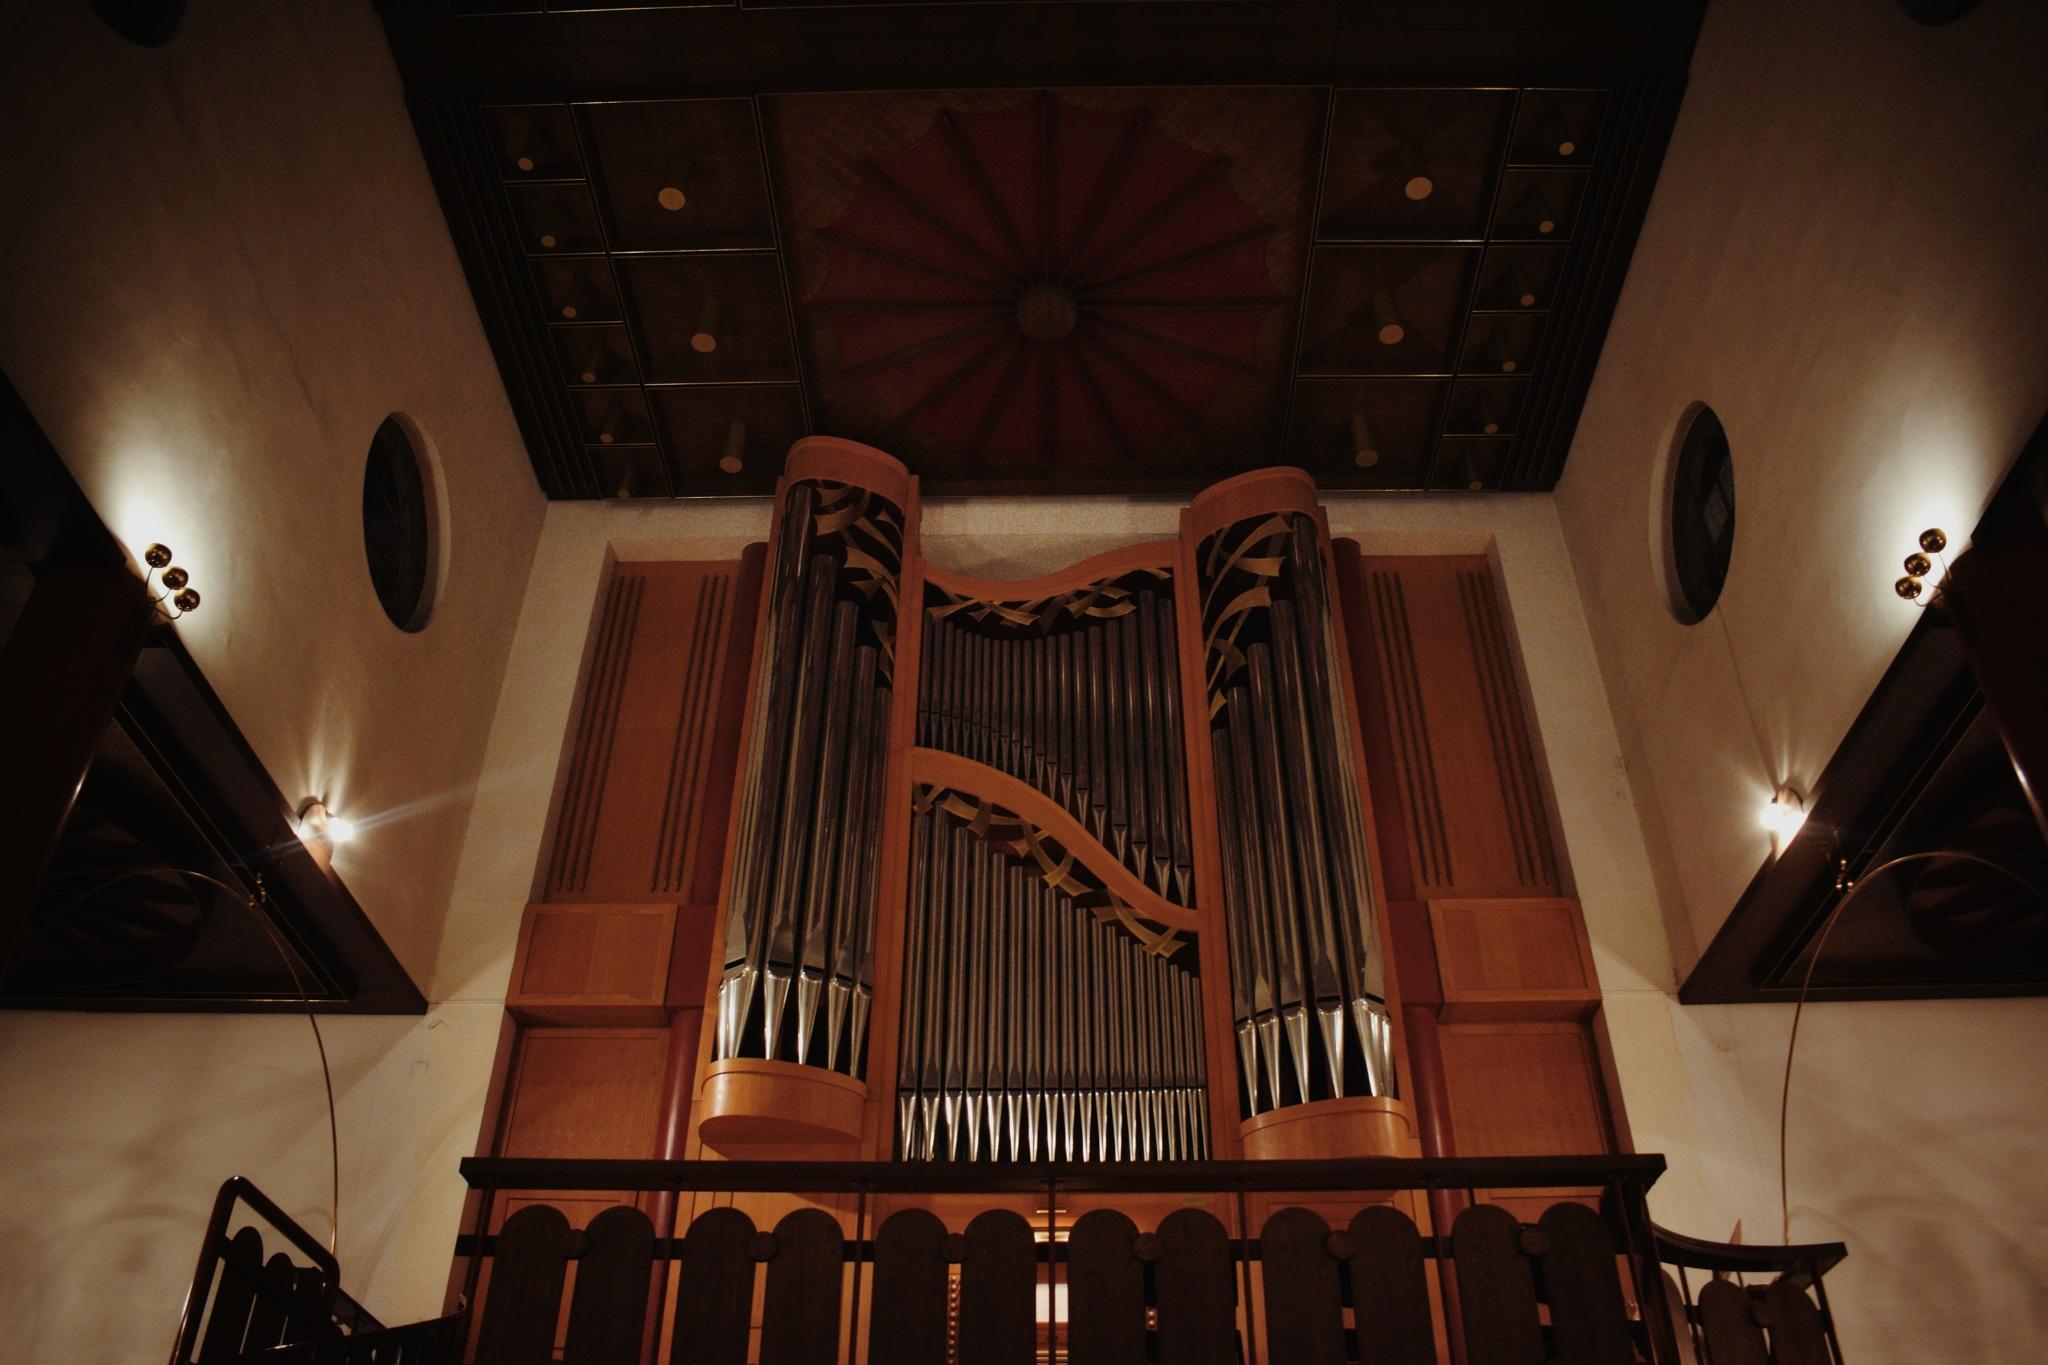 Organ by Antonina Atanaskovic